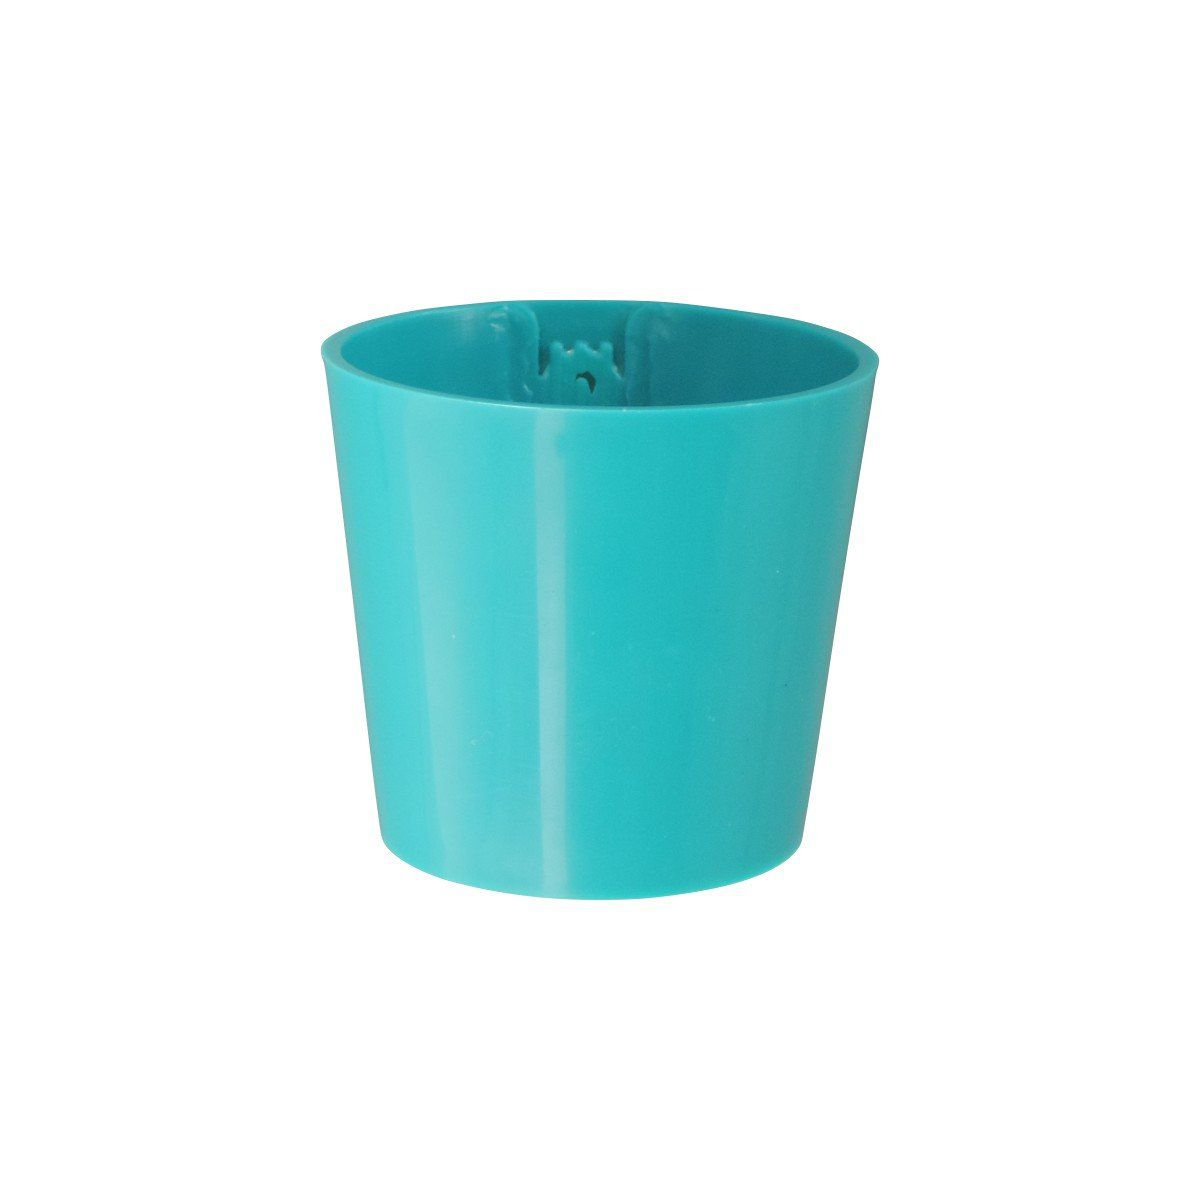 Vaso Magnético de Plástico Azul Anil 5cm x 6cm